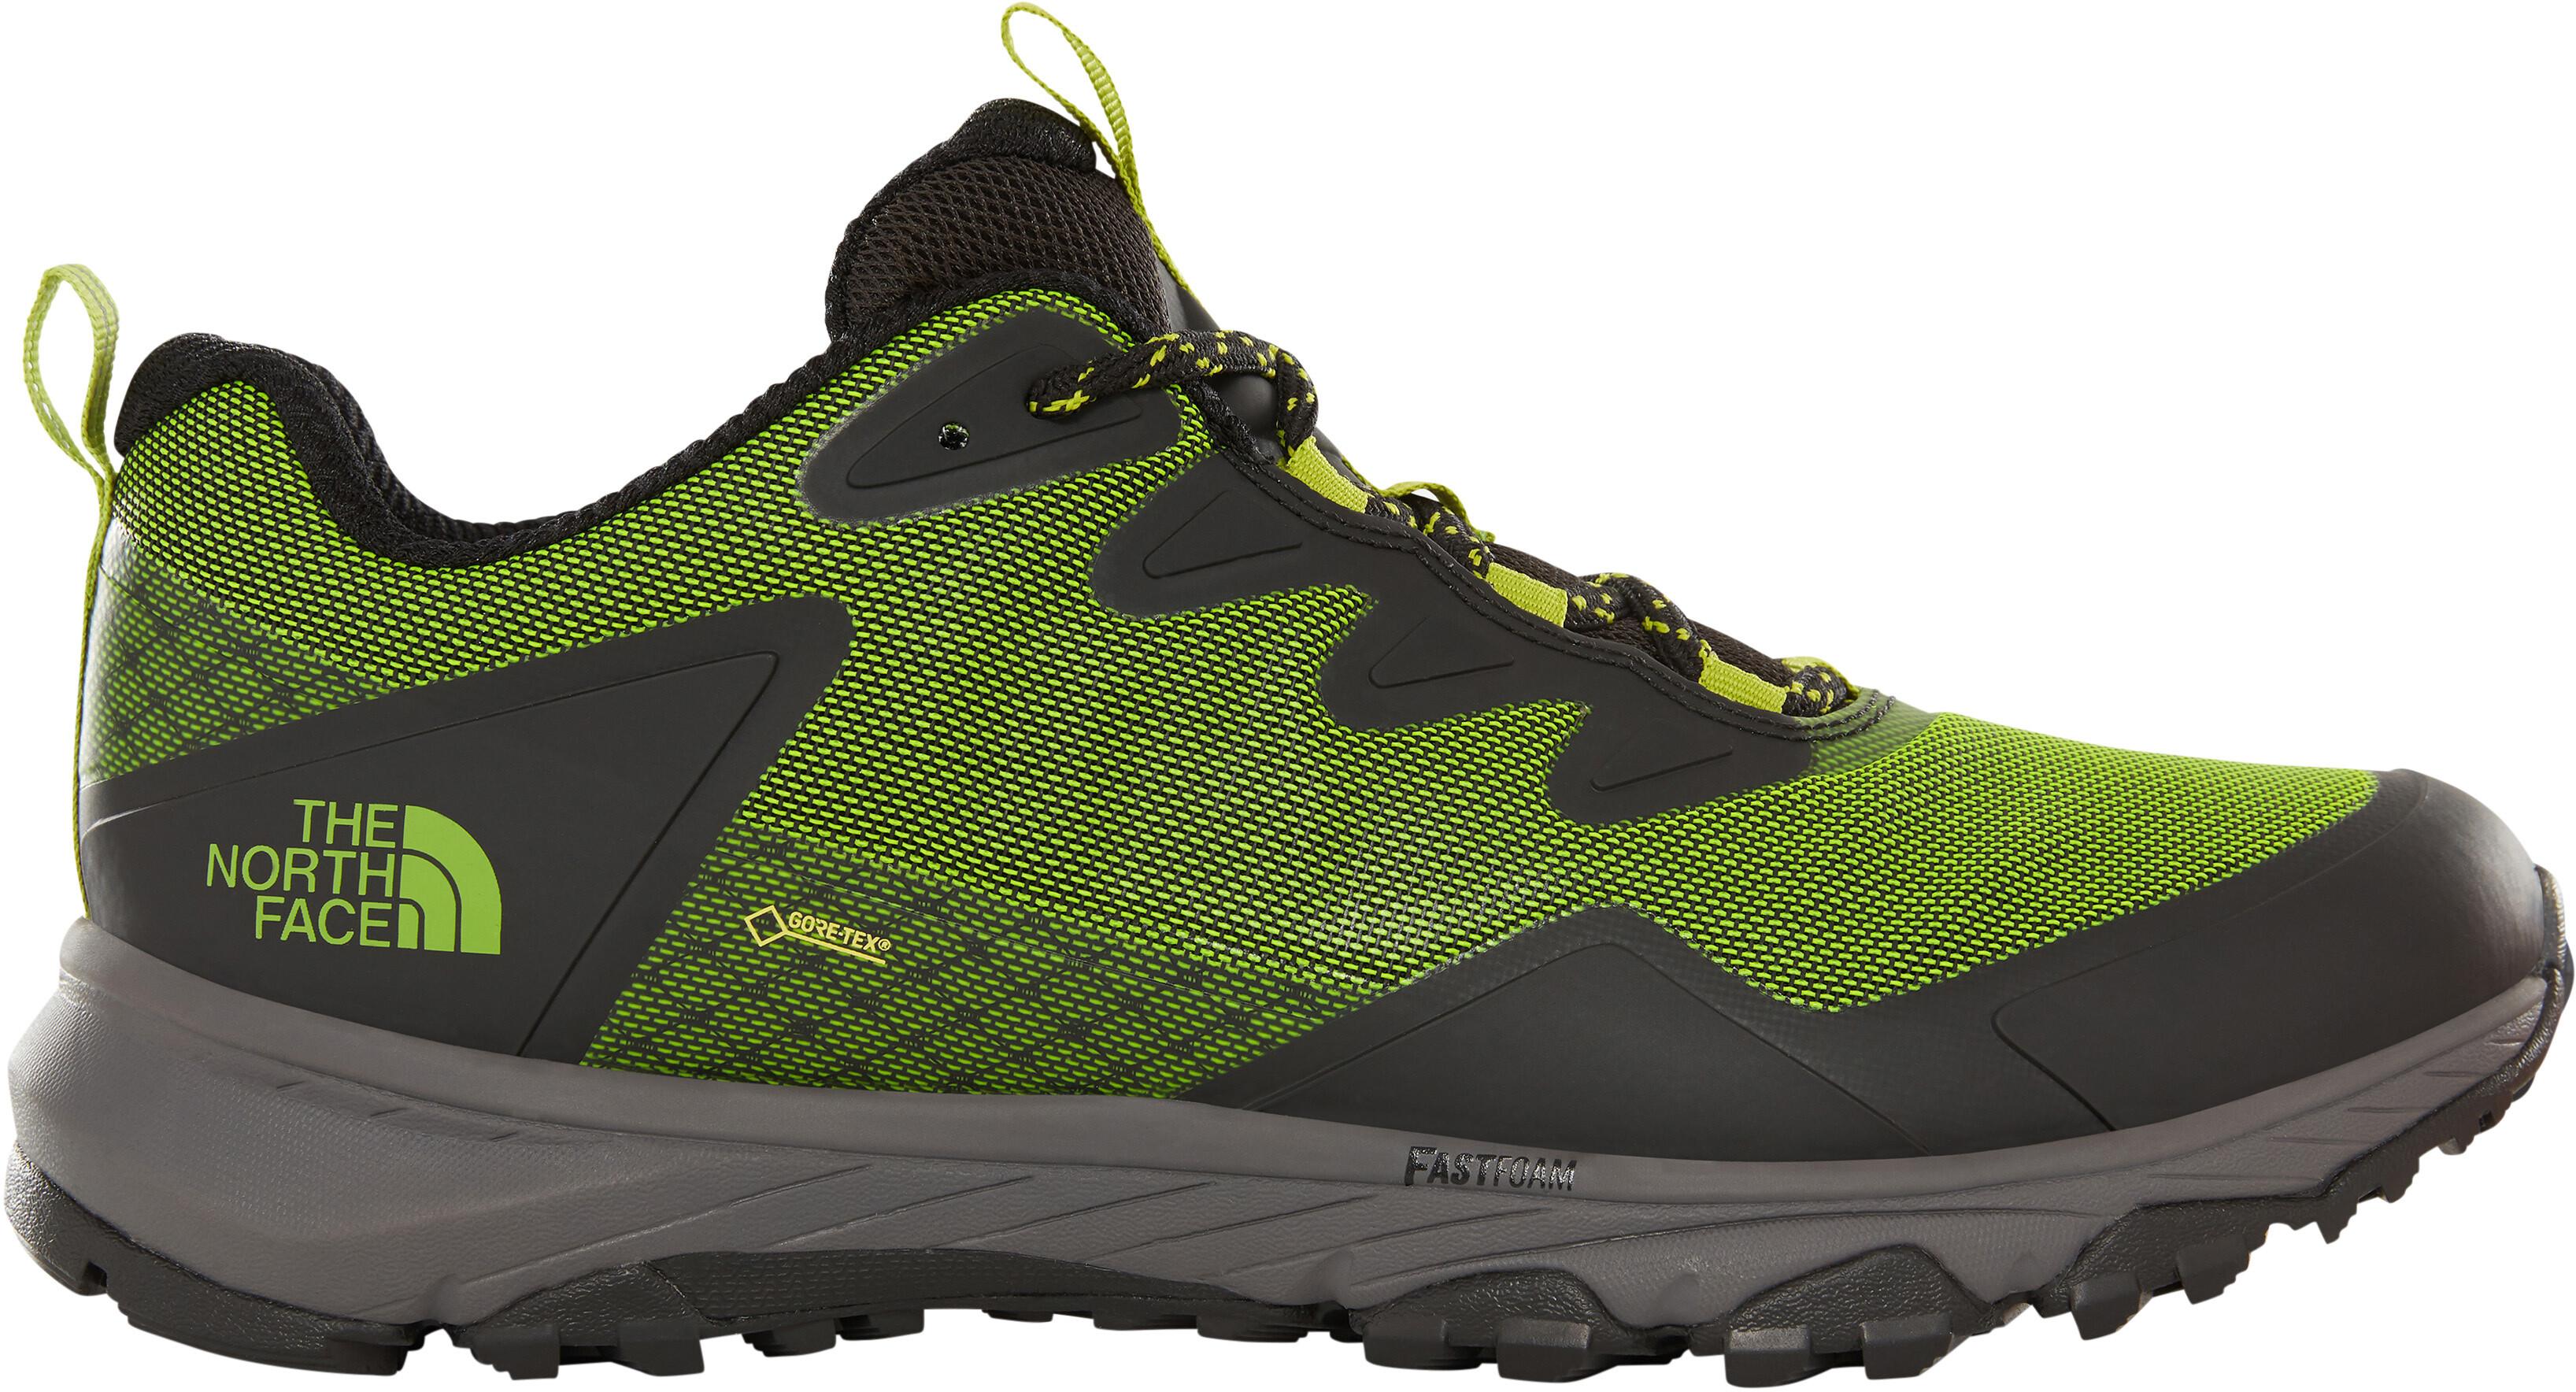 07985c09d The North Face Ultra Fastpack III GTX Shoes Men tnf black/tender green